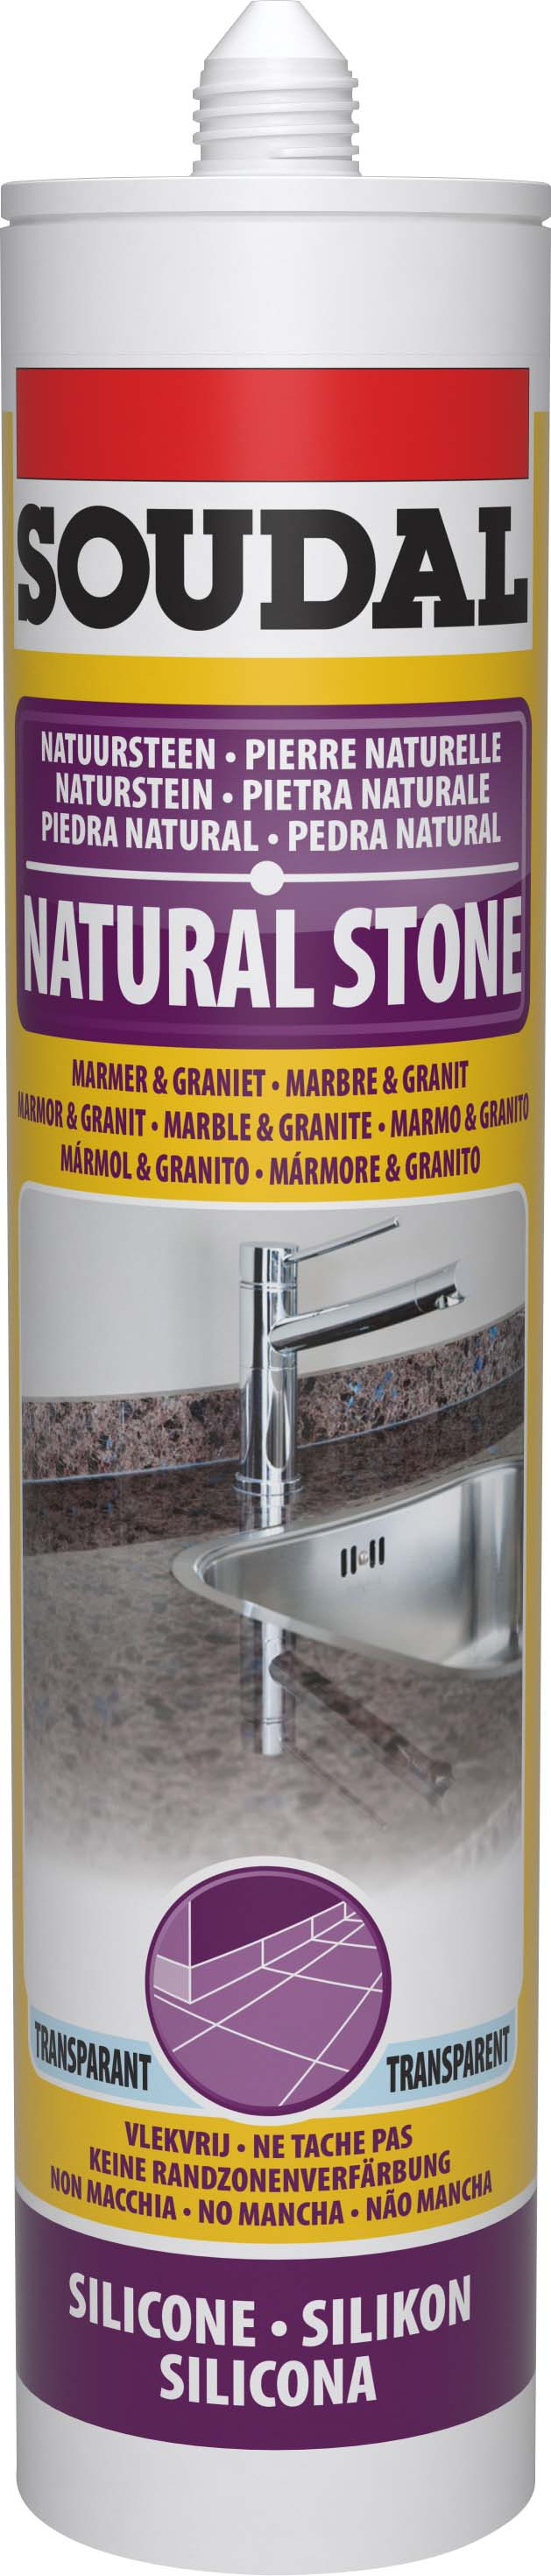 Natuursteensilicone marmergrijs/gris marbre 300 ml